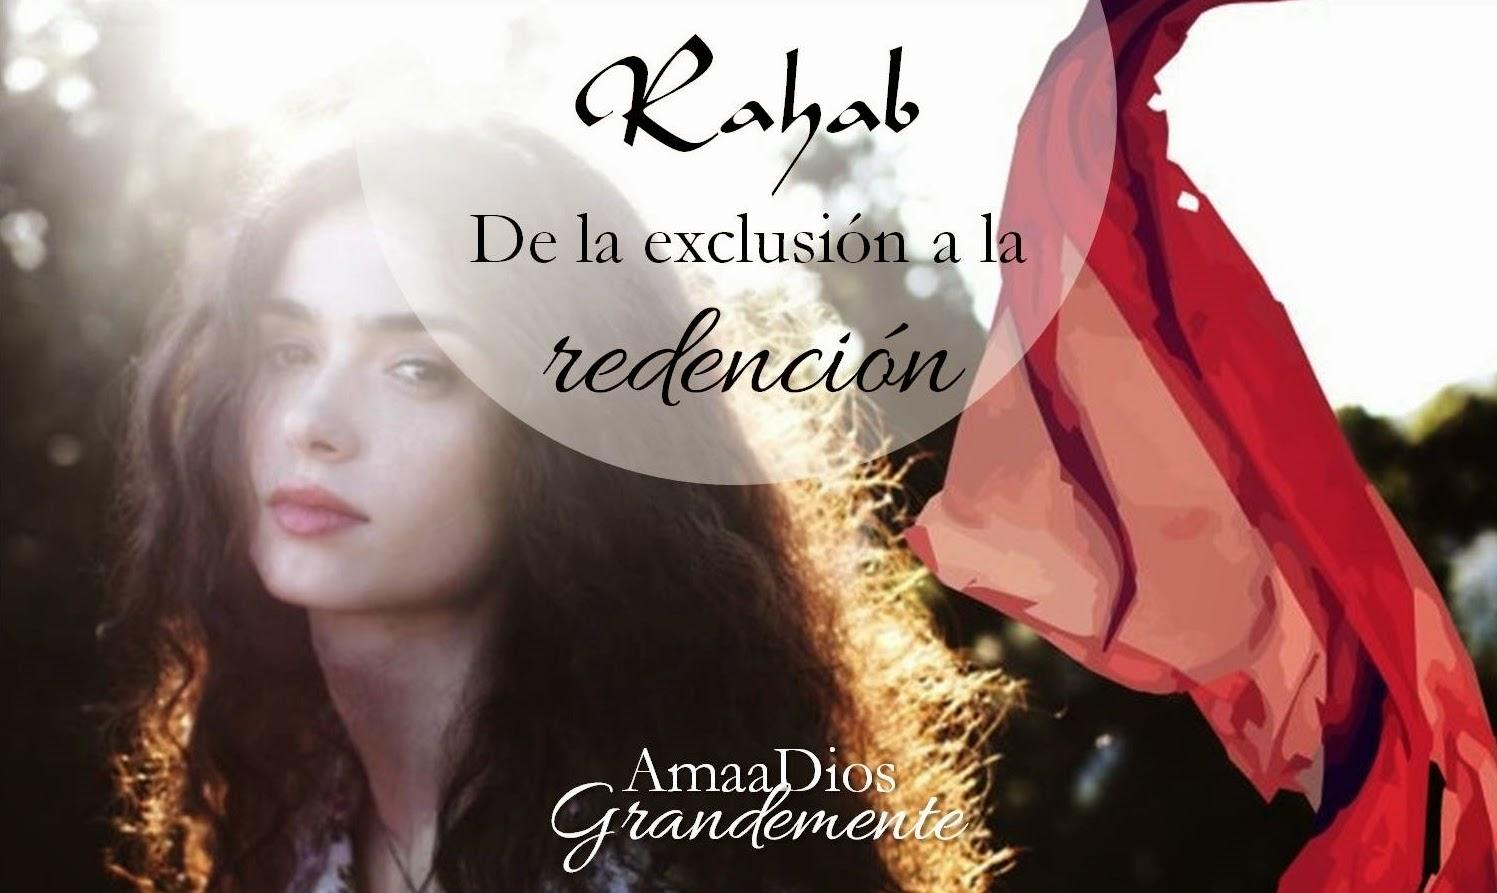 http://amaadiosgrandemente.com/2014/12/09/rahab-la-ramera/